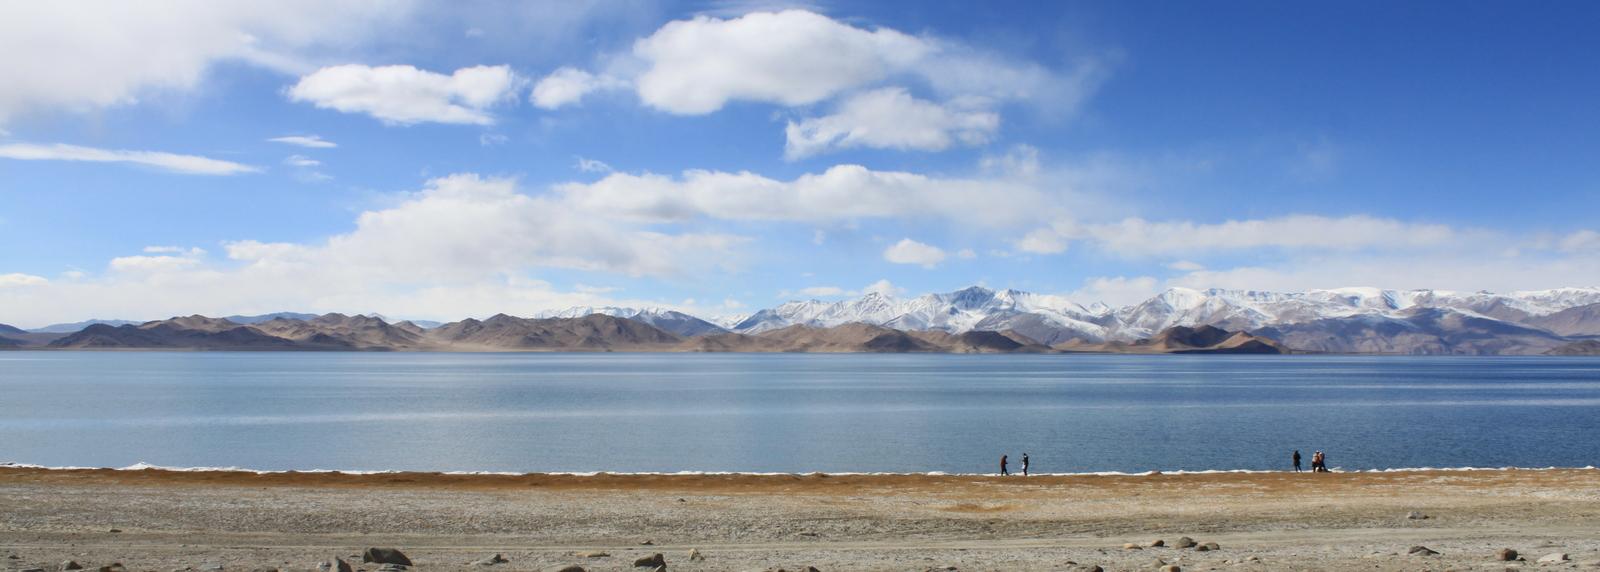 Kara-kul Lake, Tadzjikistan